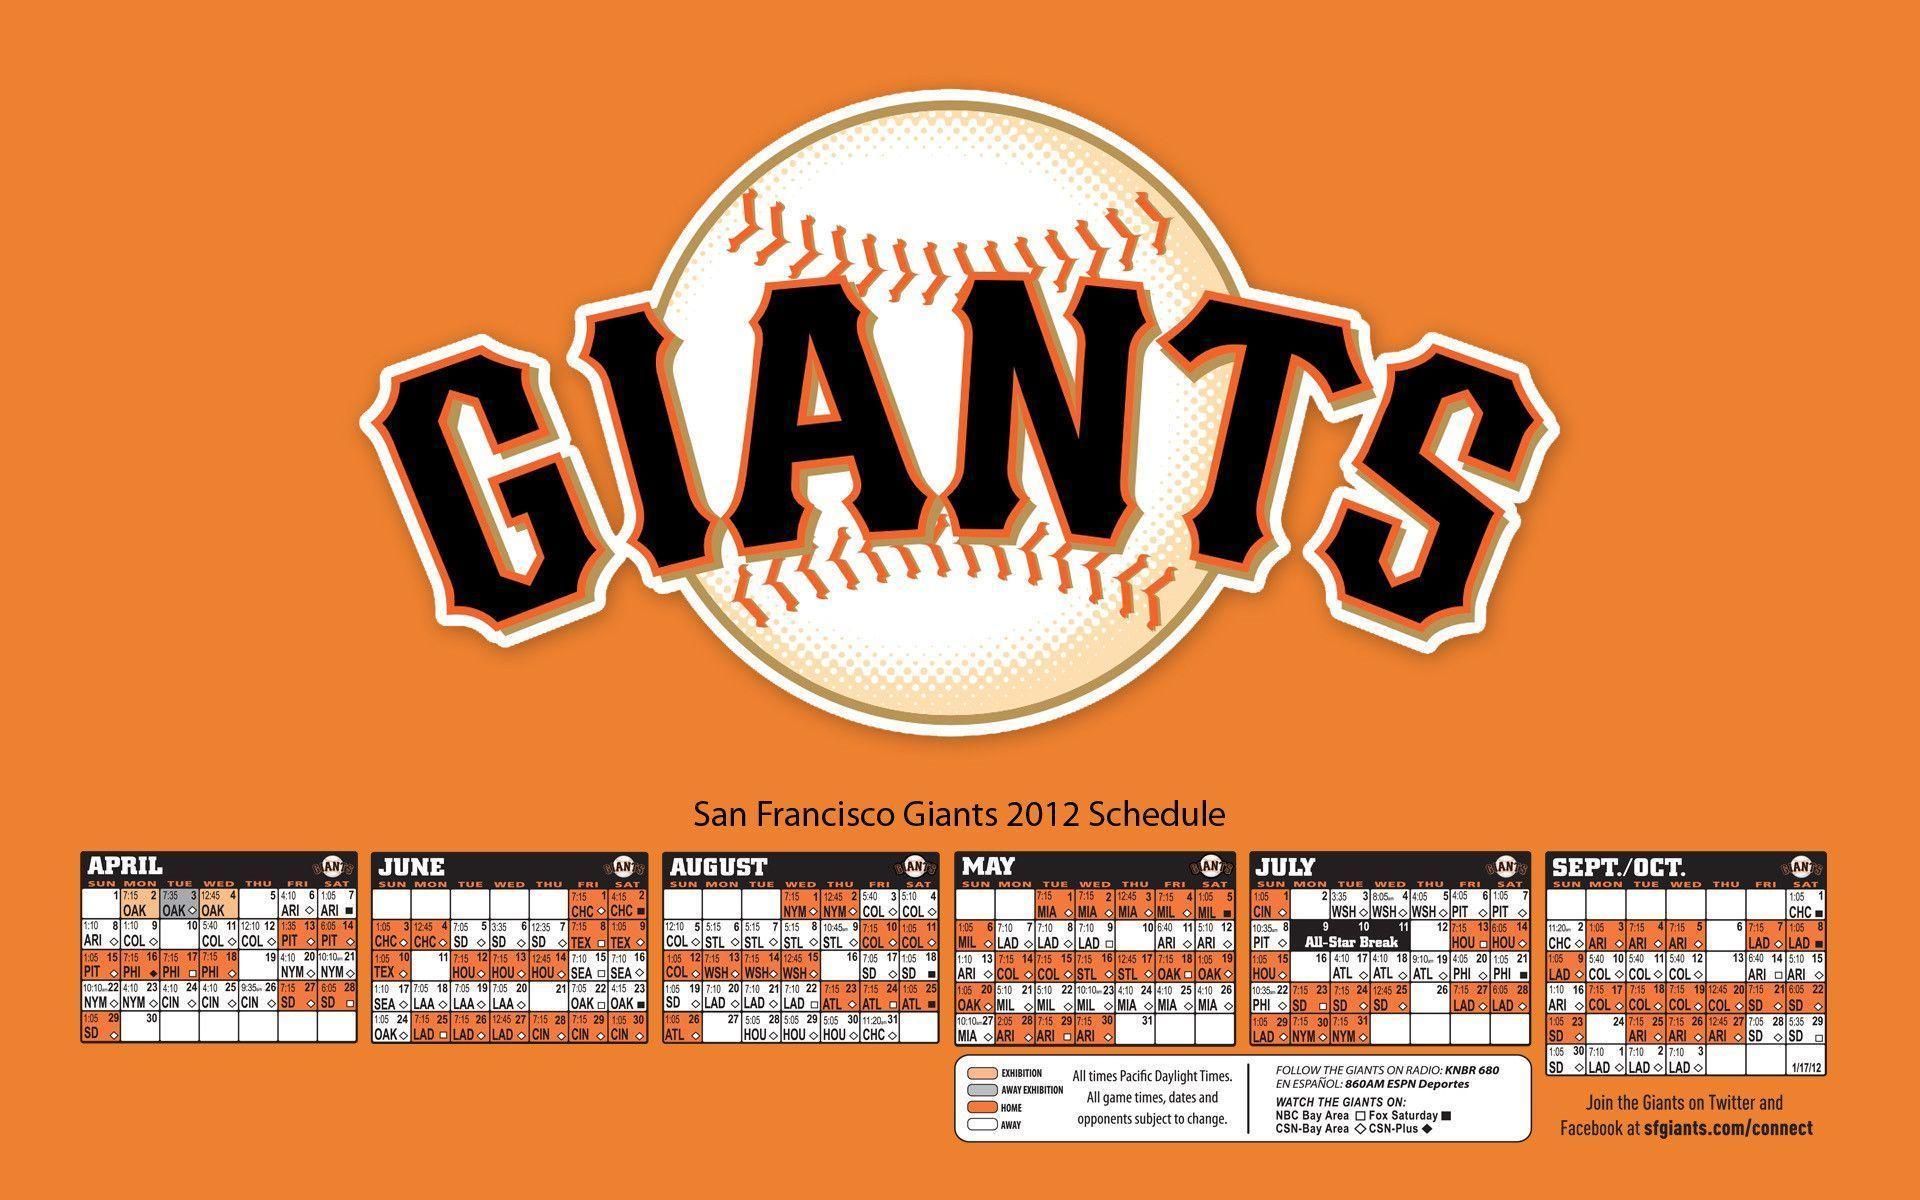 Sf giants 2015 schedule wallpapers wallpaper cave - Sf giants schedule wallpaper ...